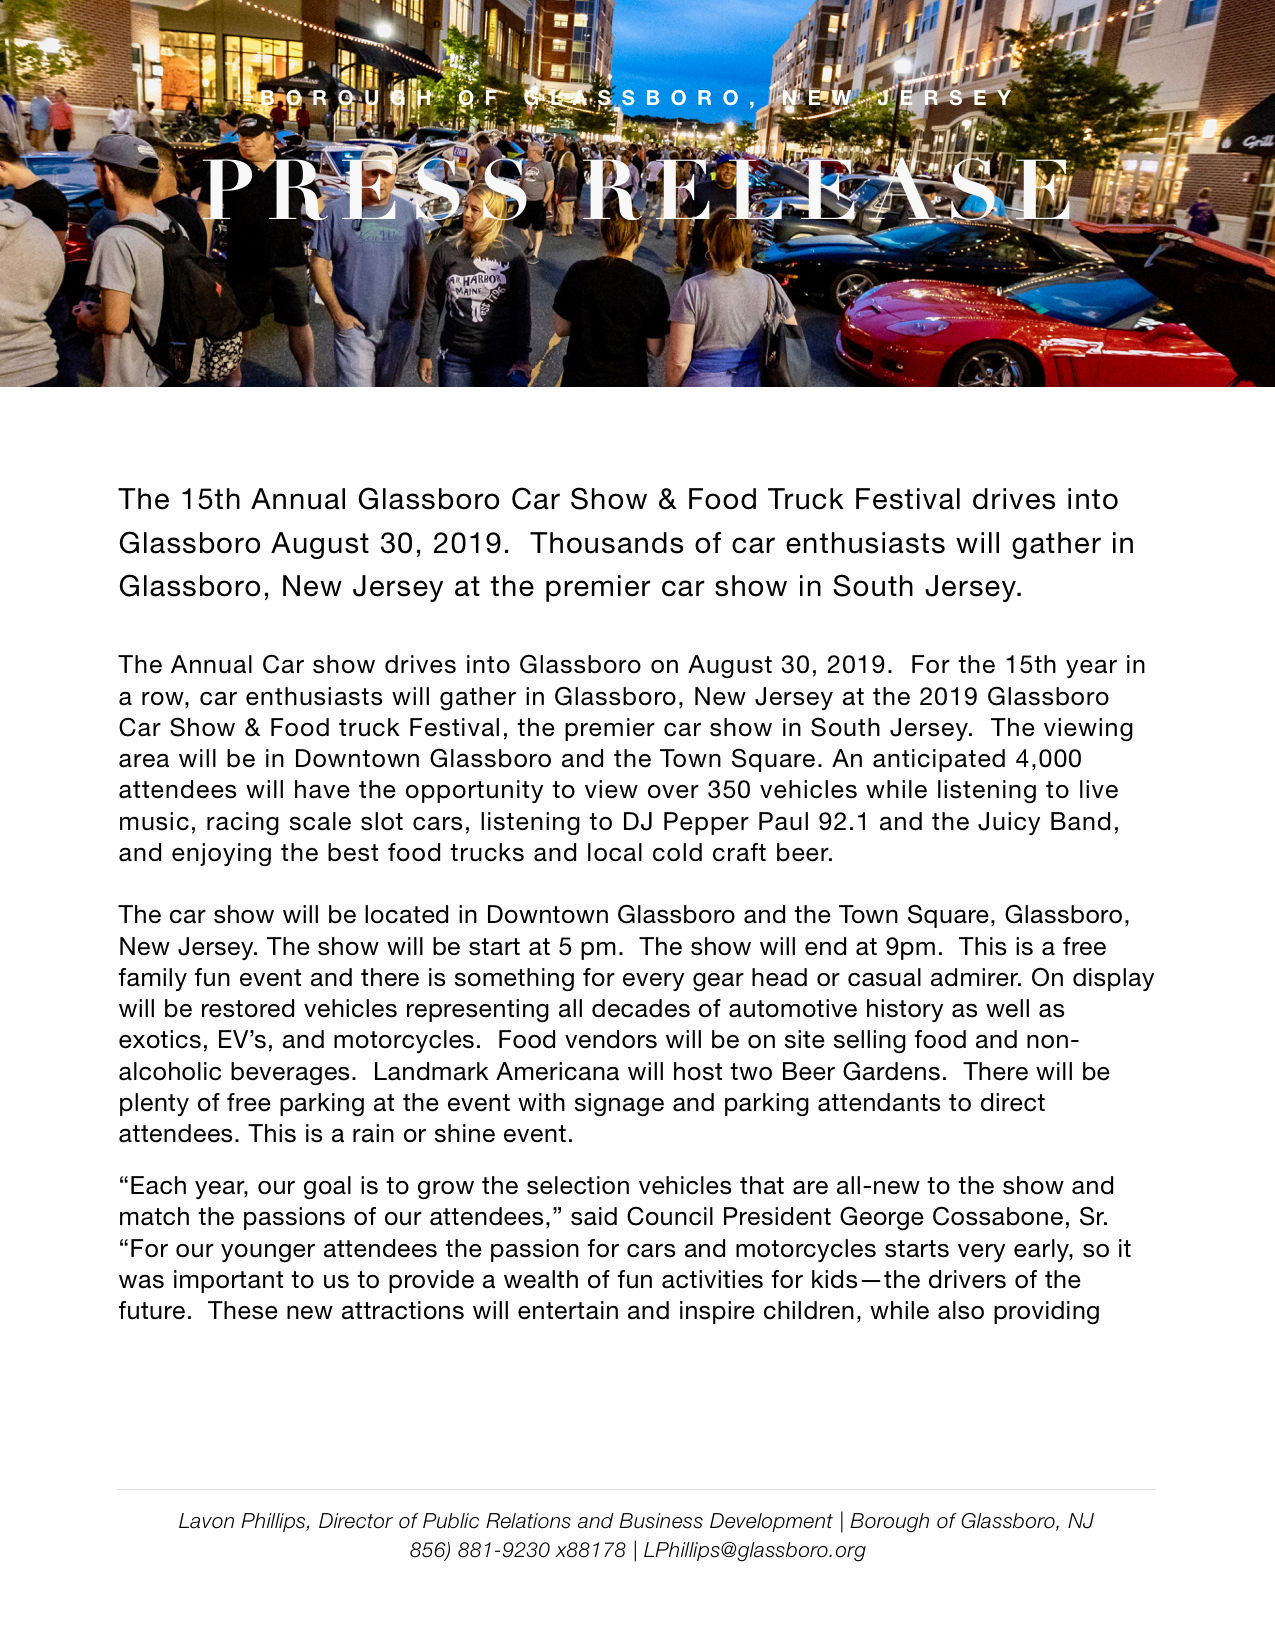 Glassboro NJ Press Release 2019 CAR SHOW AND FOOD TRUCK FESTIVAL .jpeg